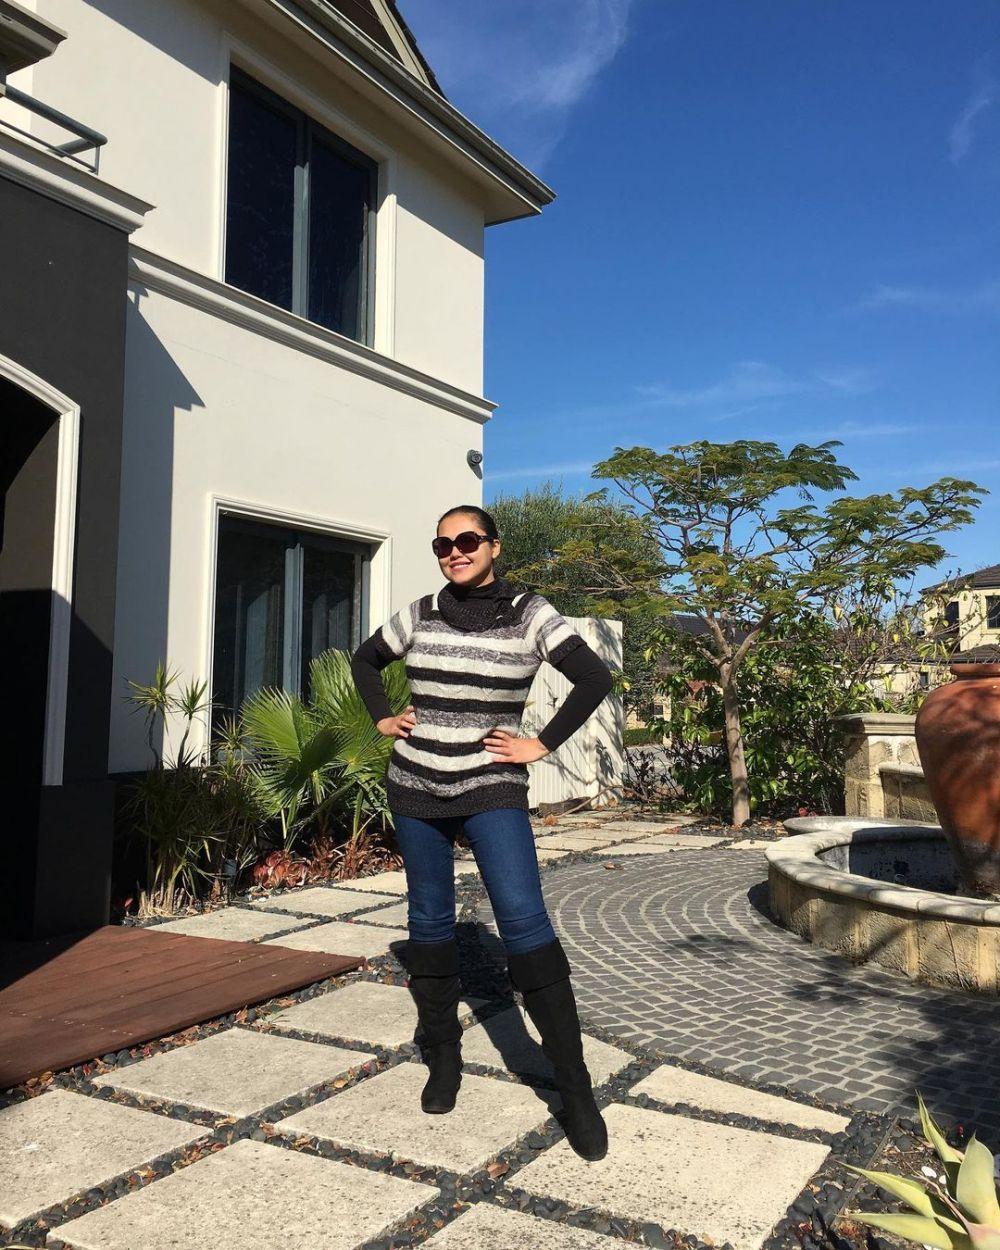 Rumah Cindy Claudia di Australia © Instagram